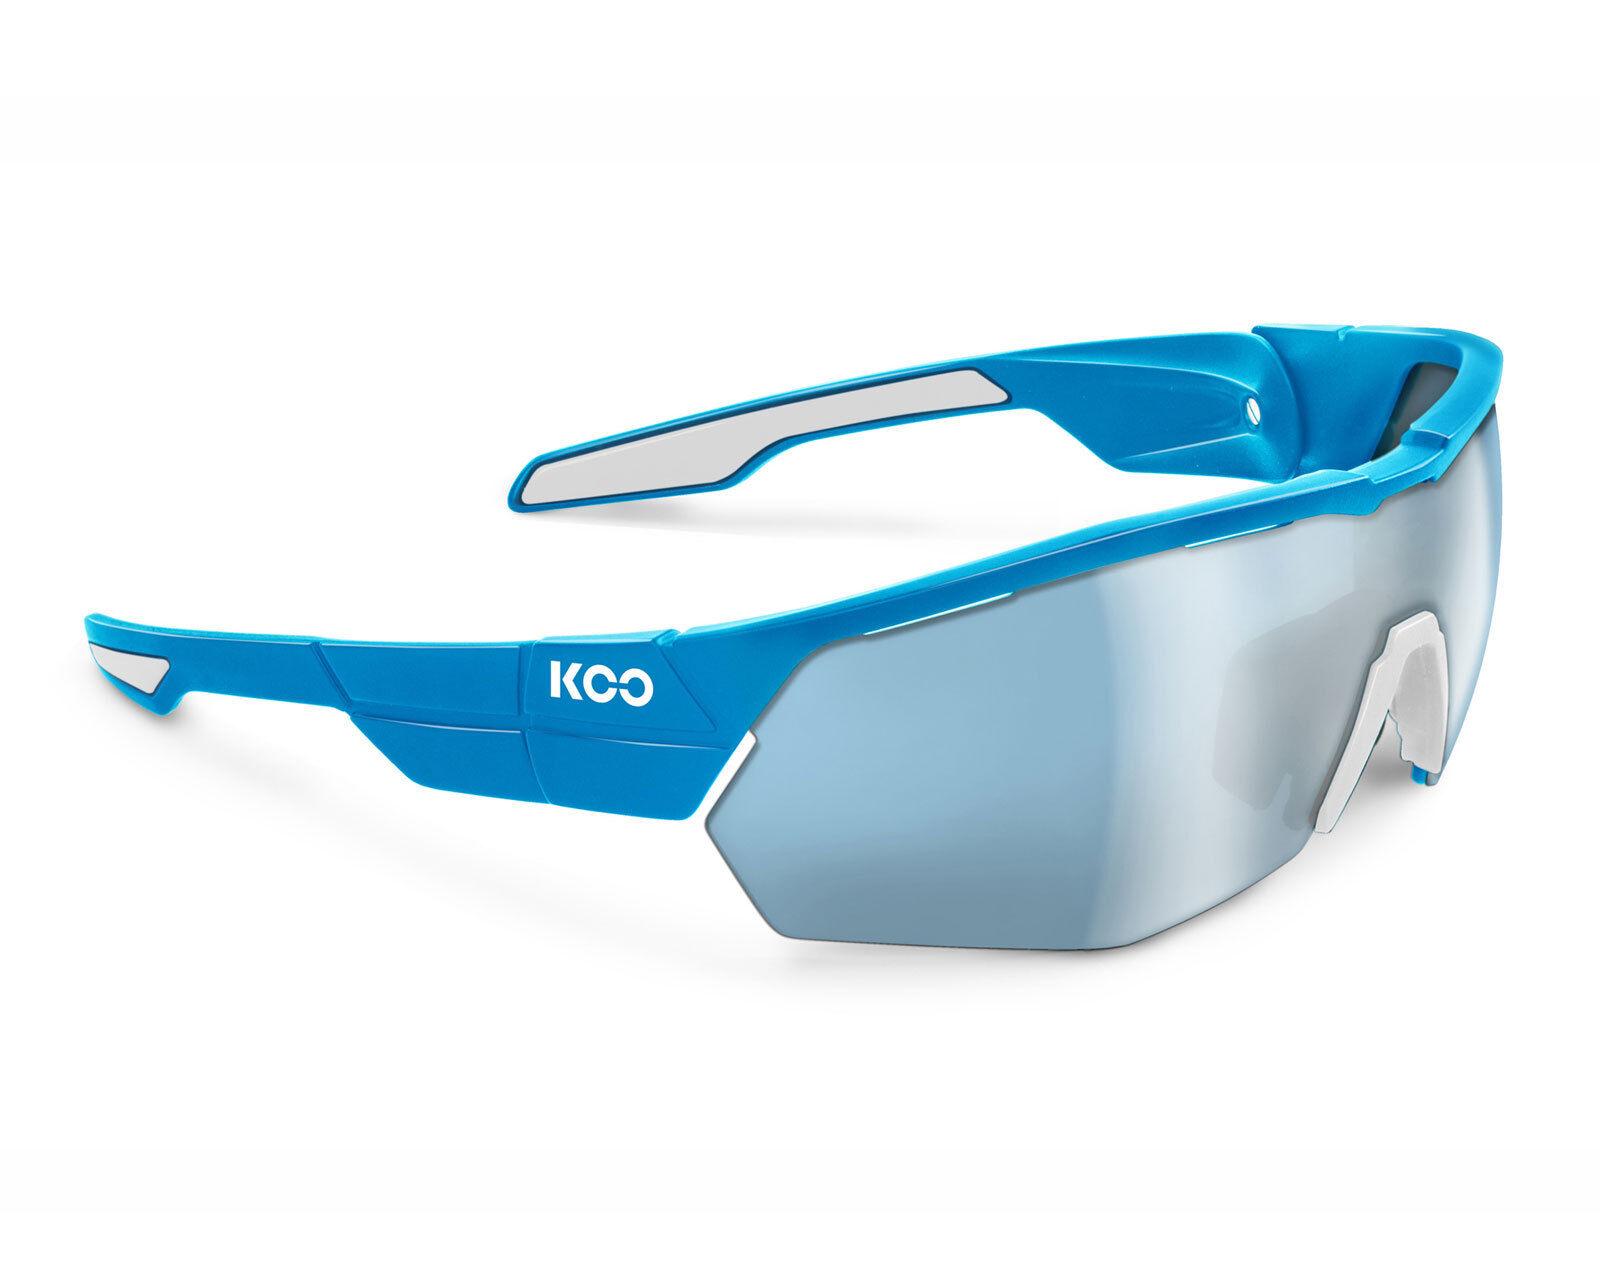 KOO OPEN CUBE  Sunglasses Asian Fit - Light bluee [Lens  Super bluee]  counter genuine